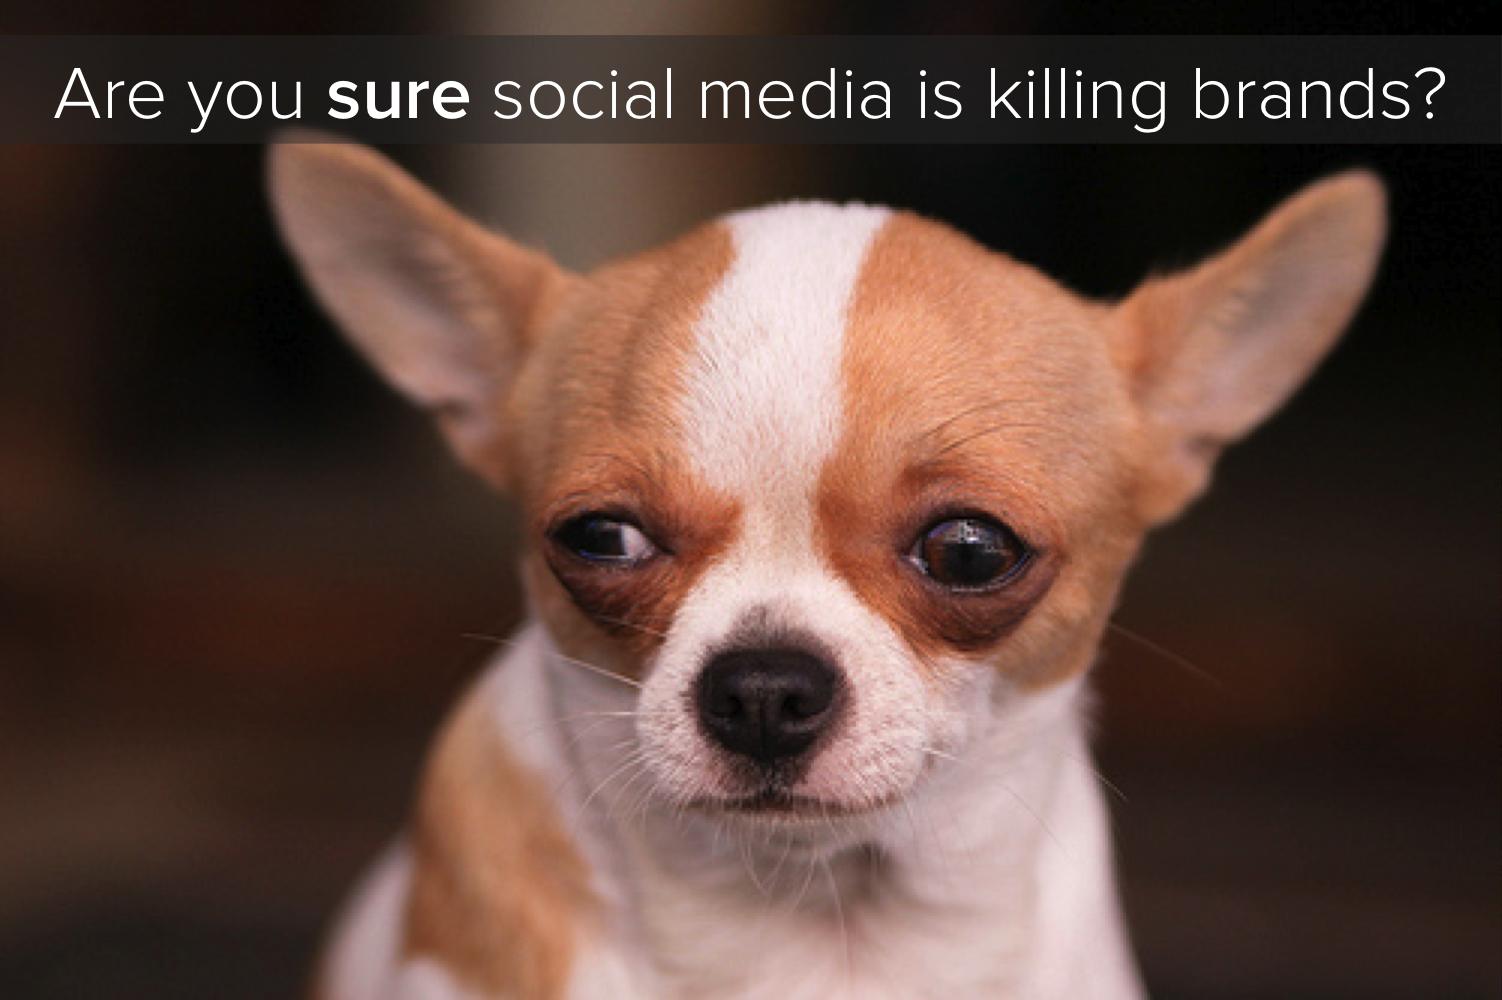 Is Social Media Killing Brands?